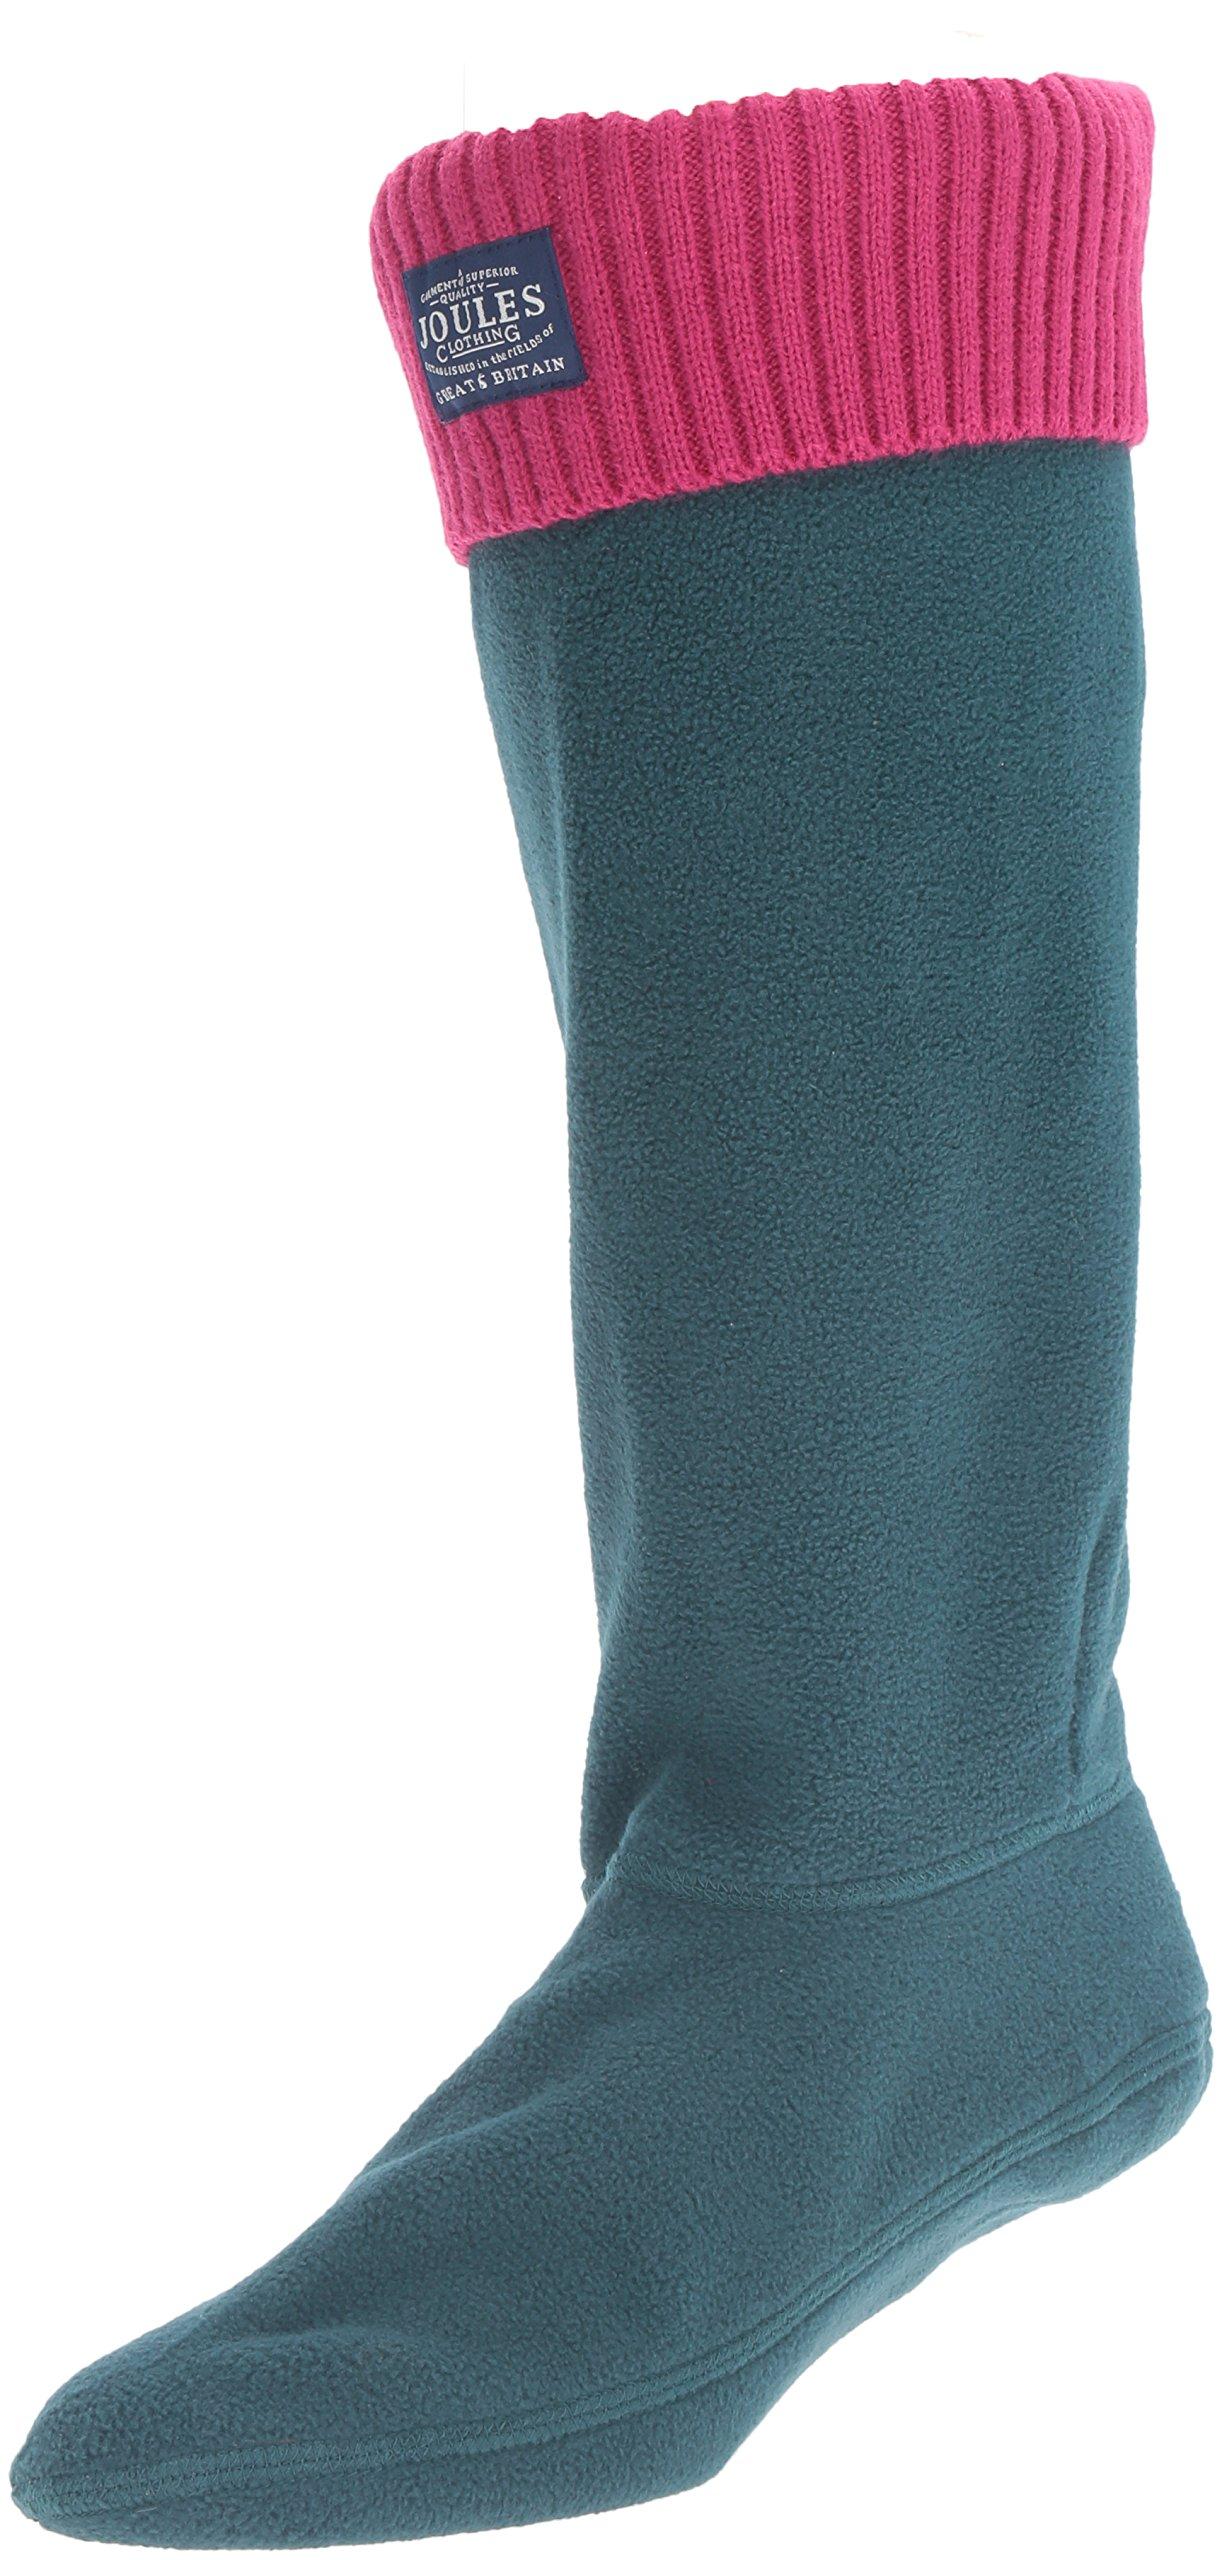 Joules Women's Hilston Rain Boot Sock, Dark Green, 7 M US